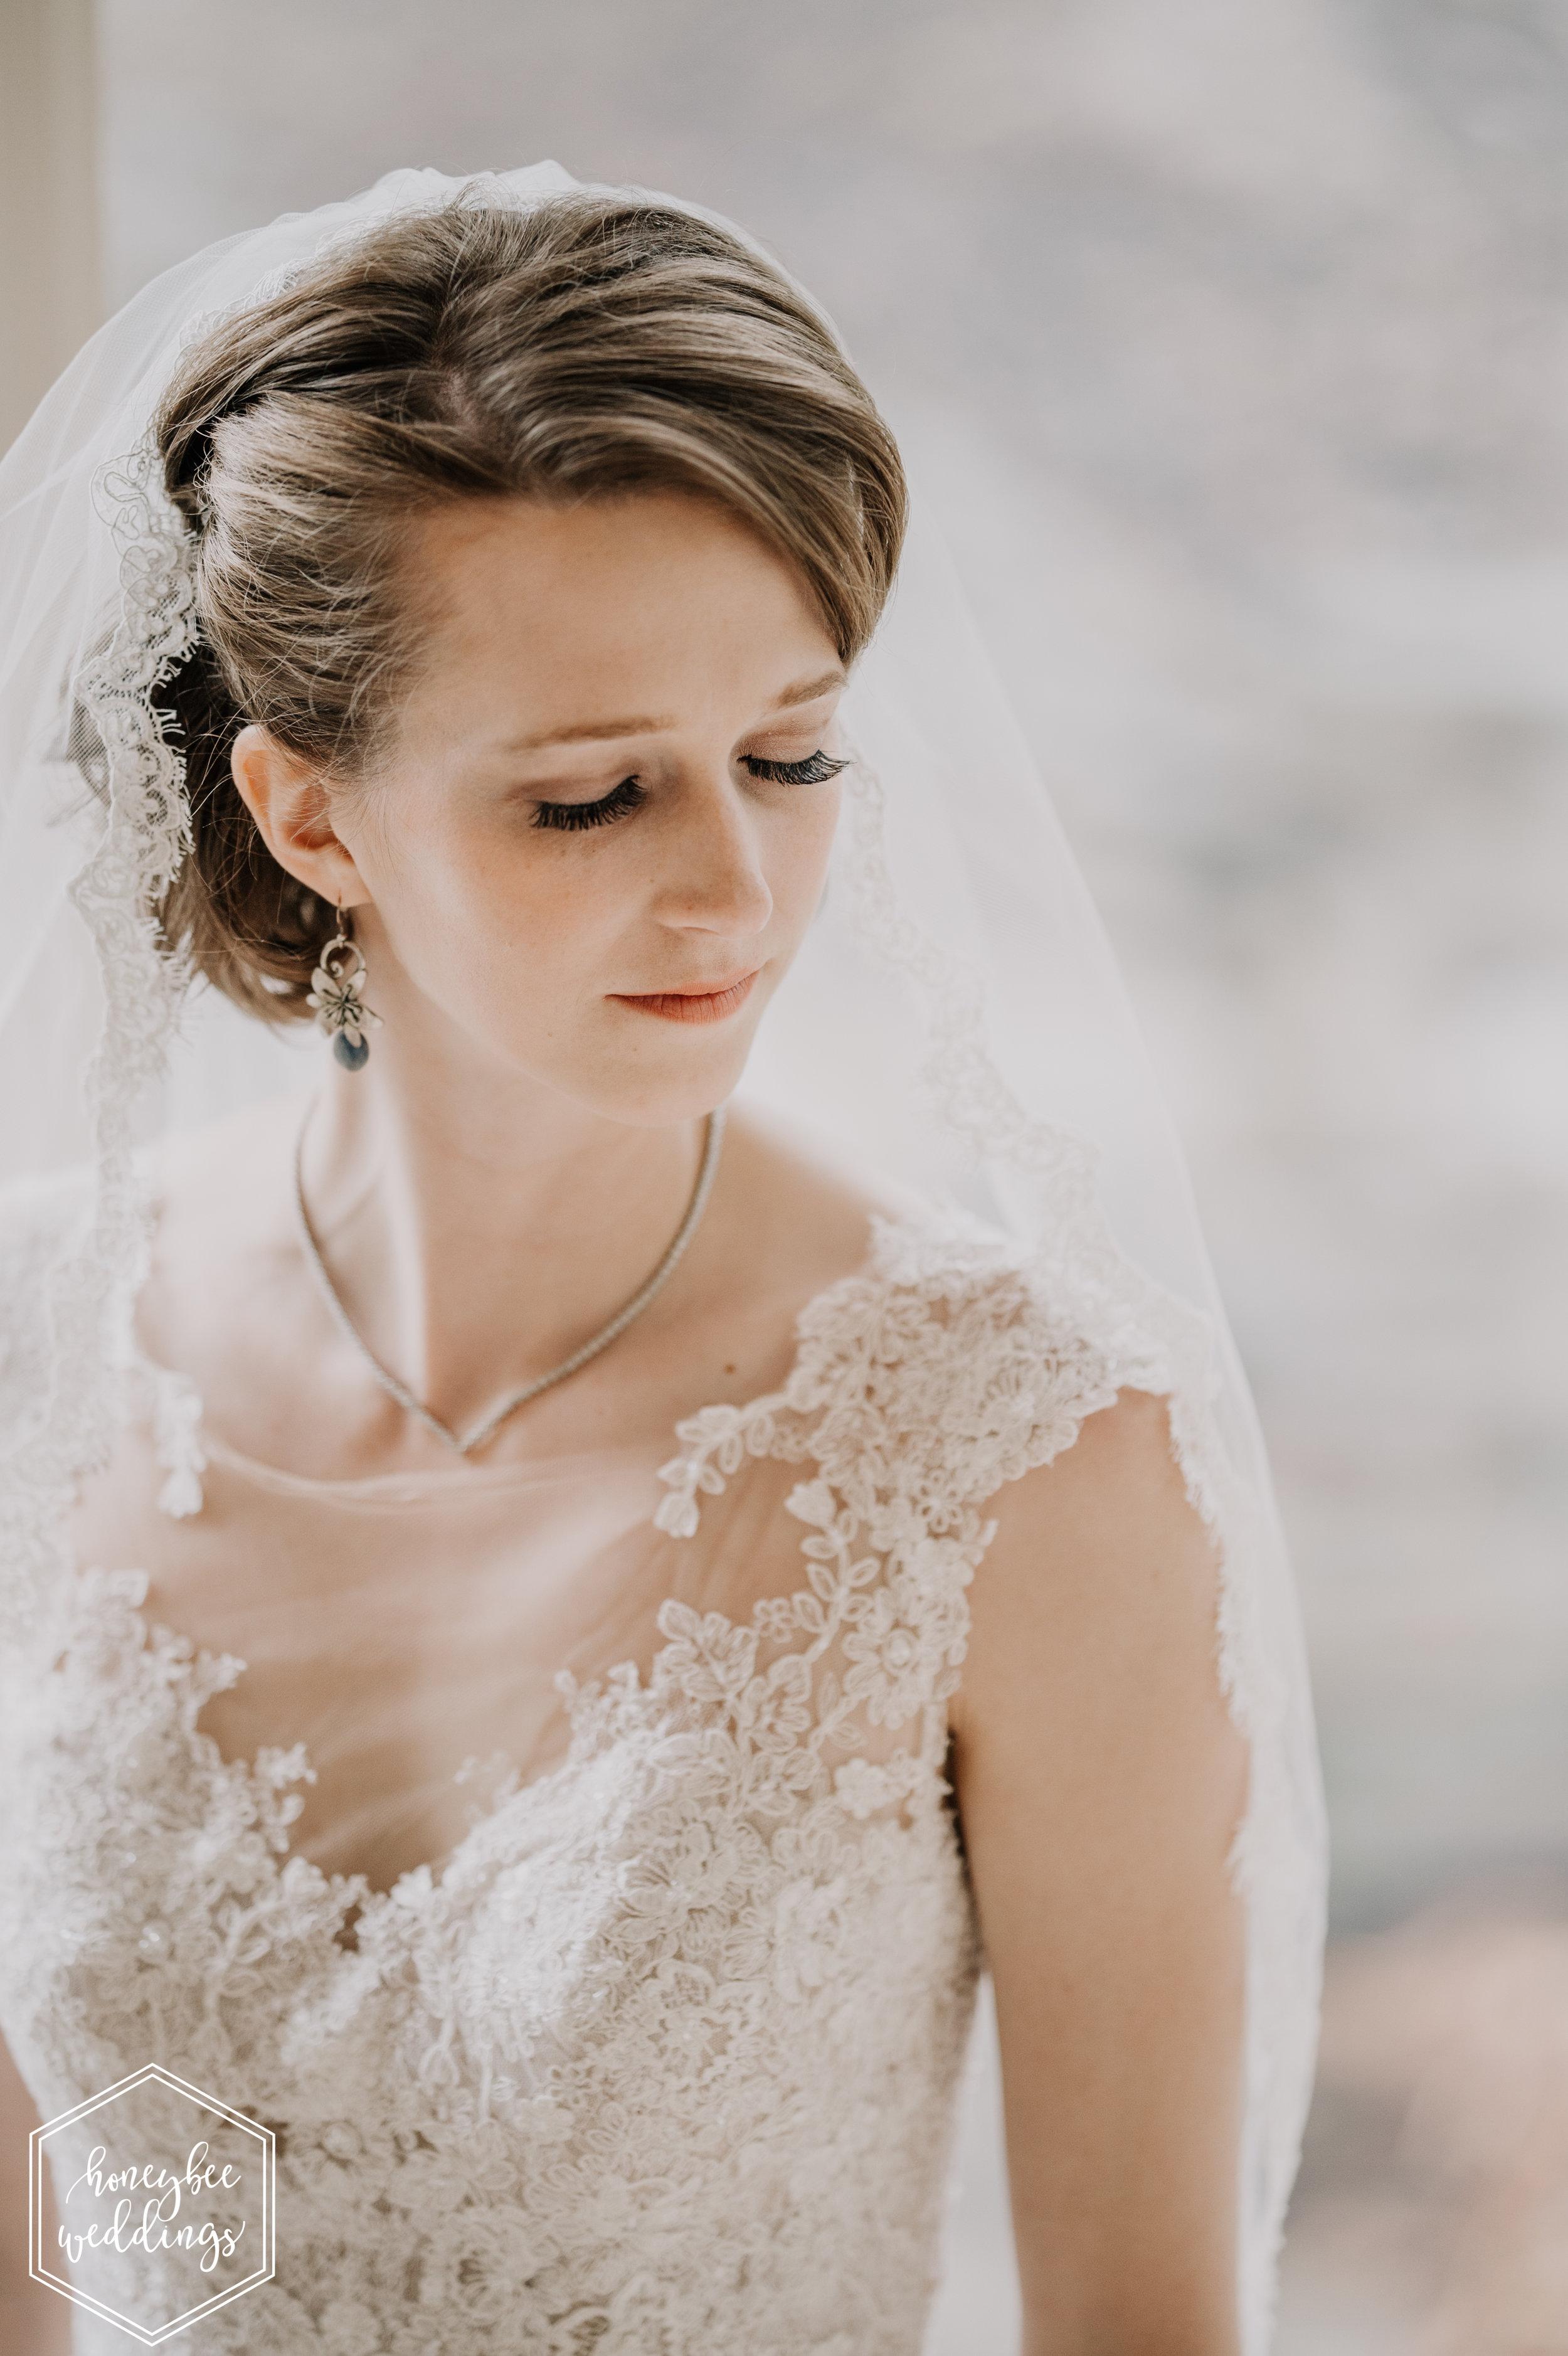 134 Riverside Country Club Wedding_Montana Wedding Photographer_Lauren Jackson + Evan Ivaldi 2018-6352.jpg